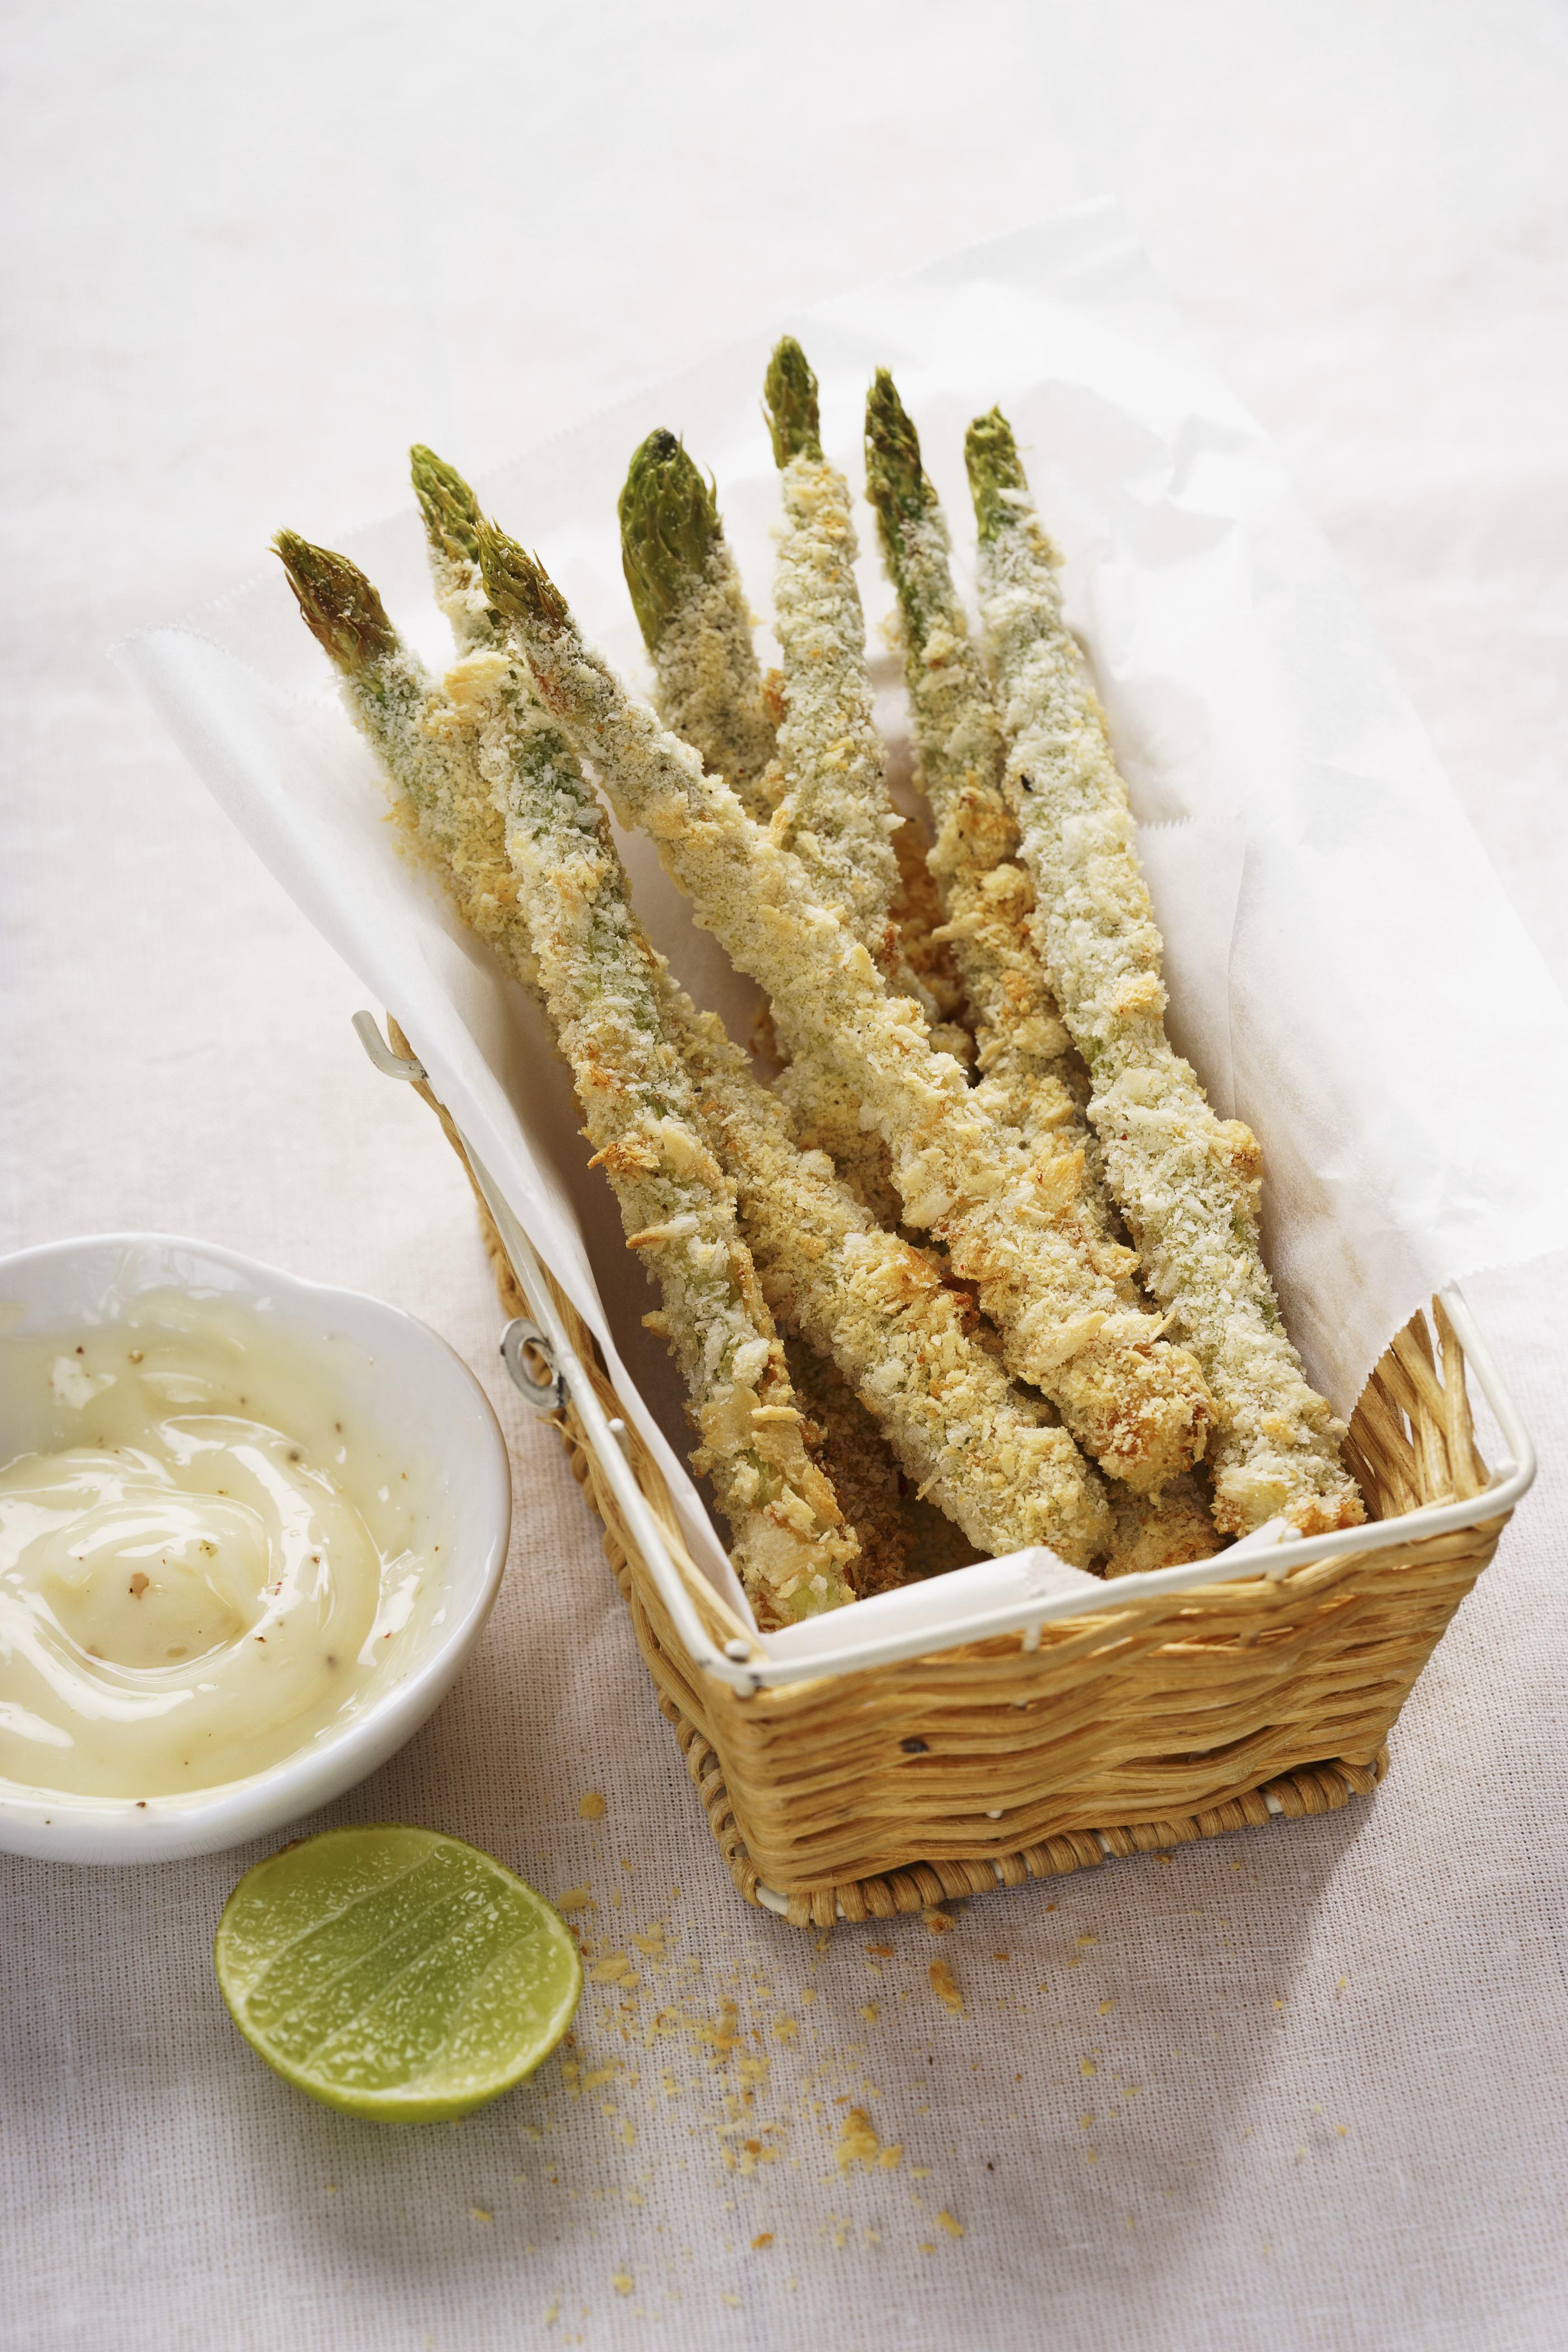 Crunchy baked asparagus fries with mayonnaise dip, healthy vegetable snack